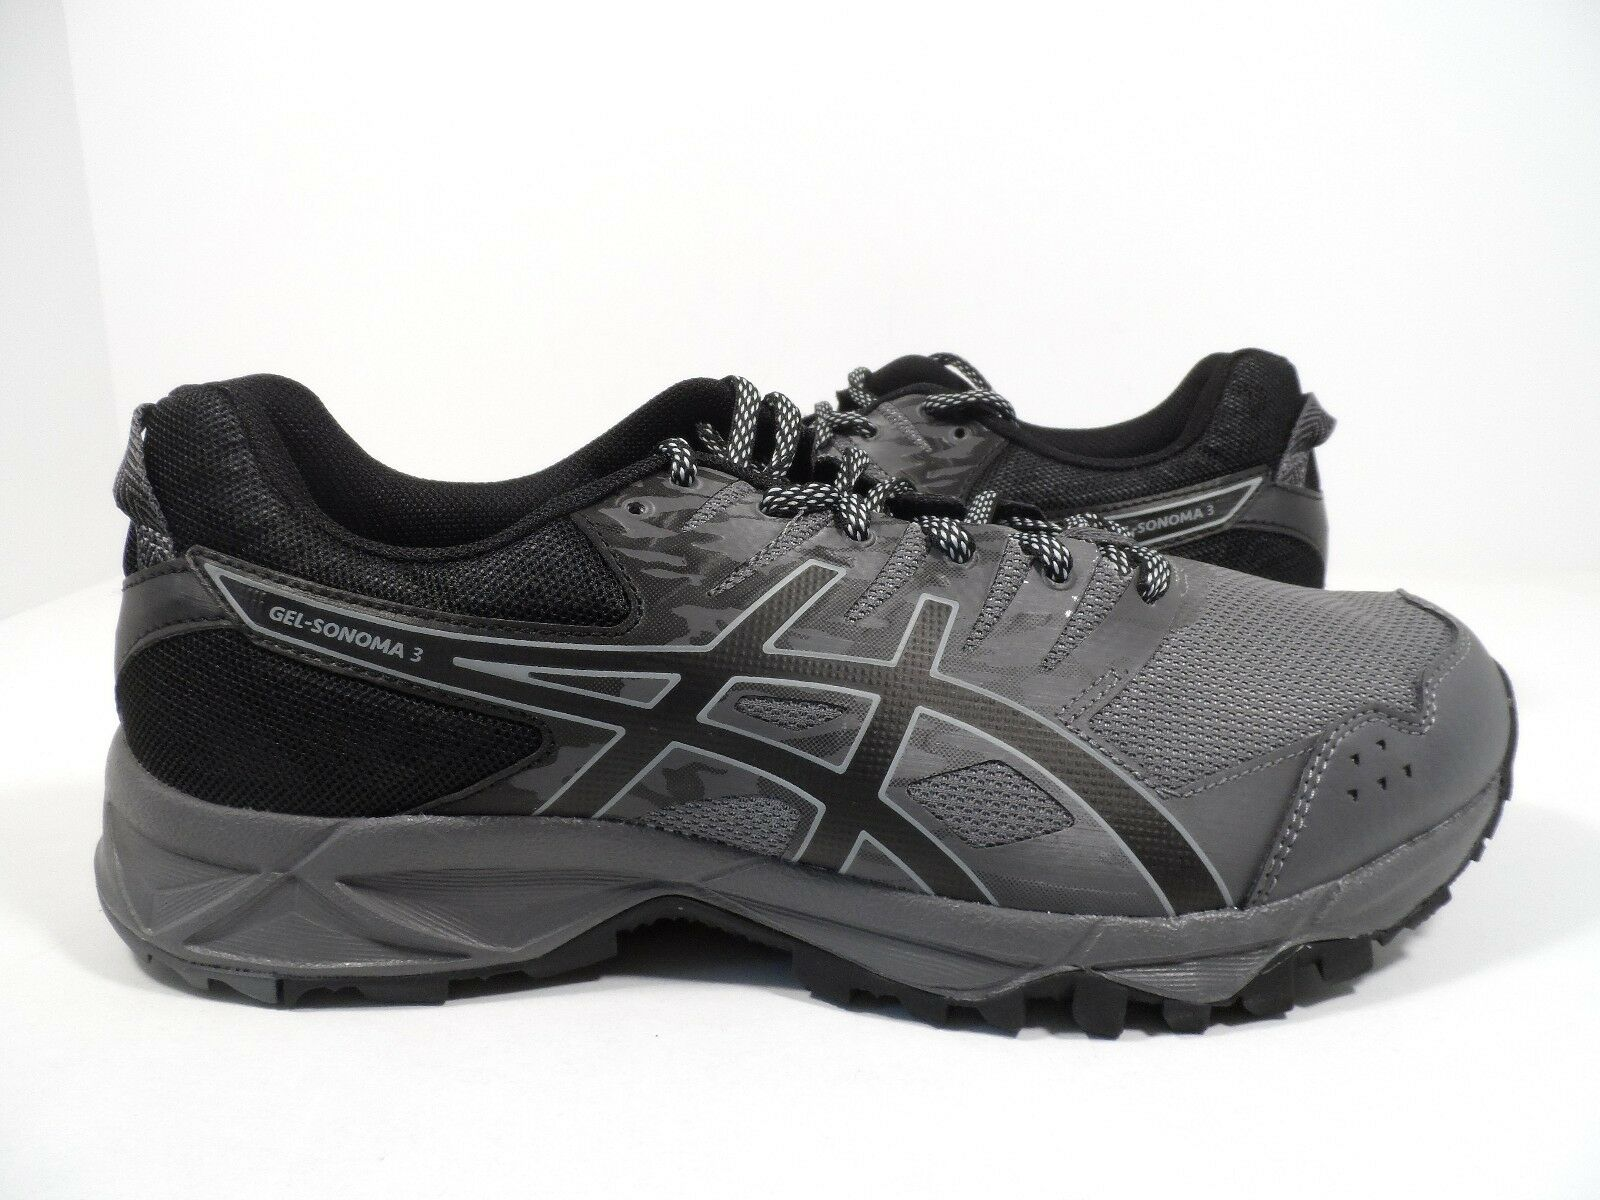 ASICS Men's Gel-Sonoma 3 Running shoes Carbon Black Midgrey Size 8 4E